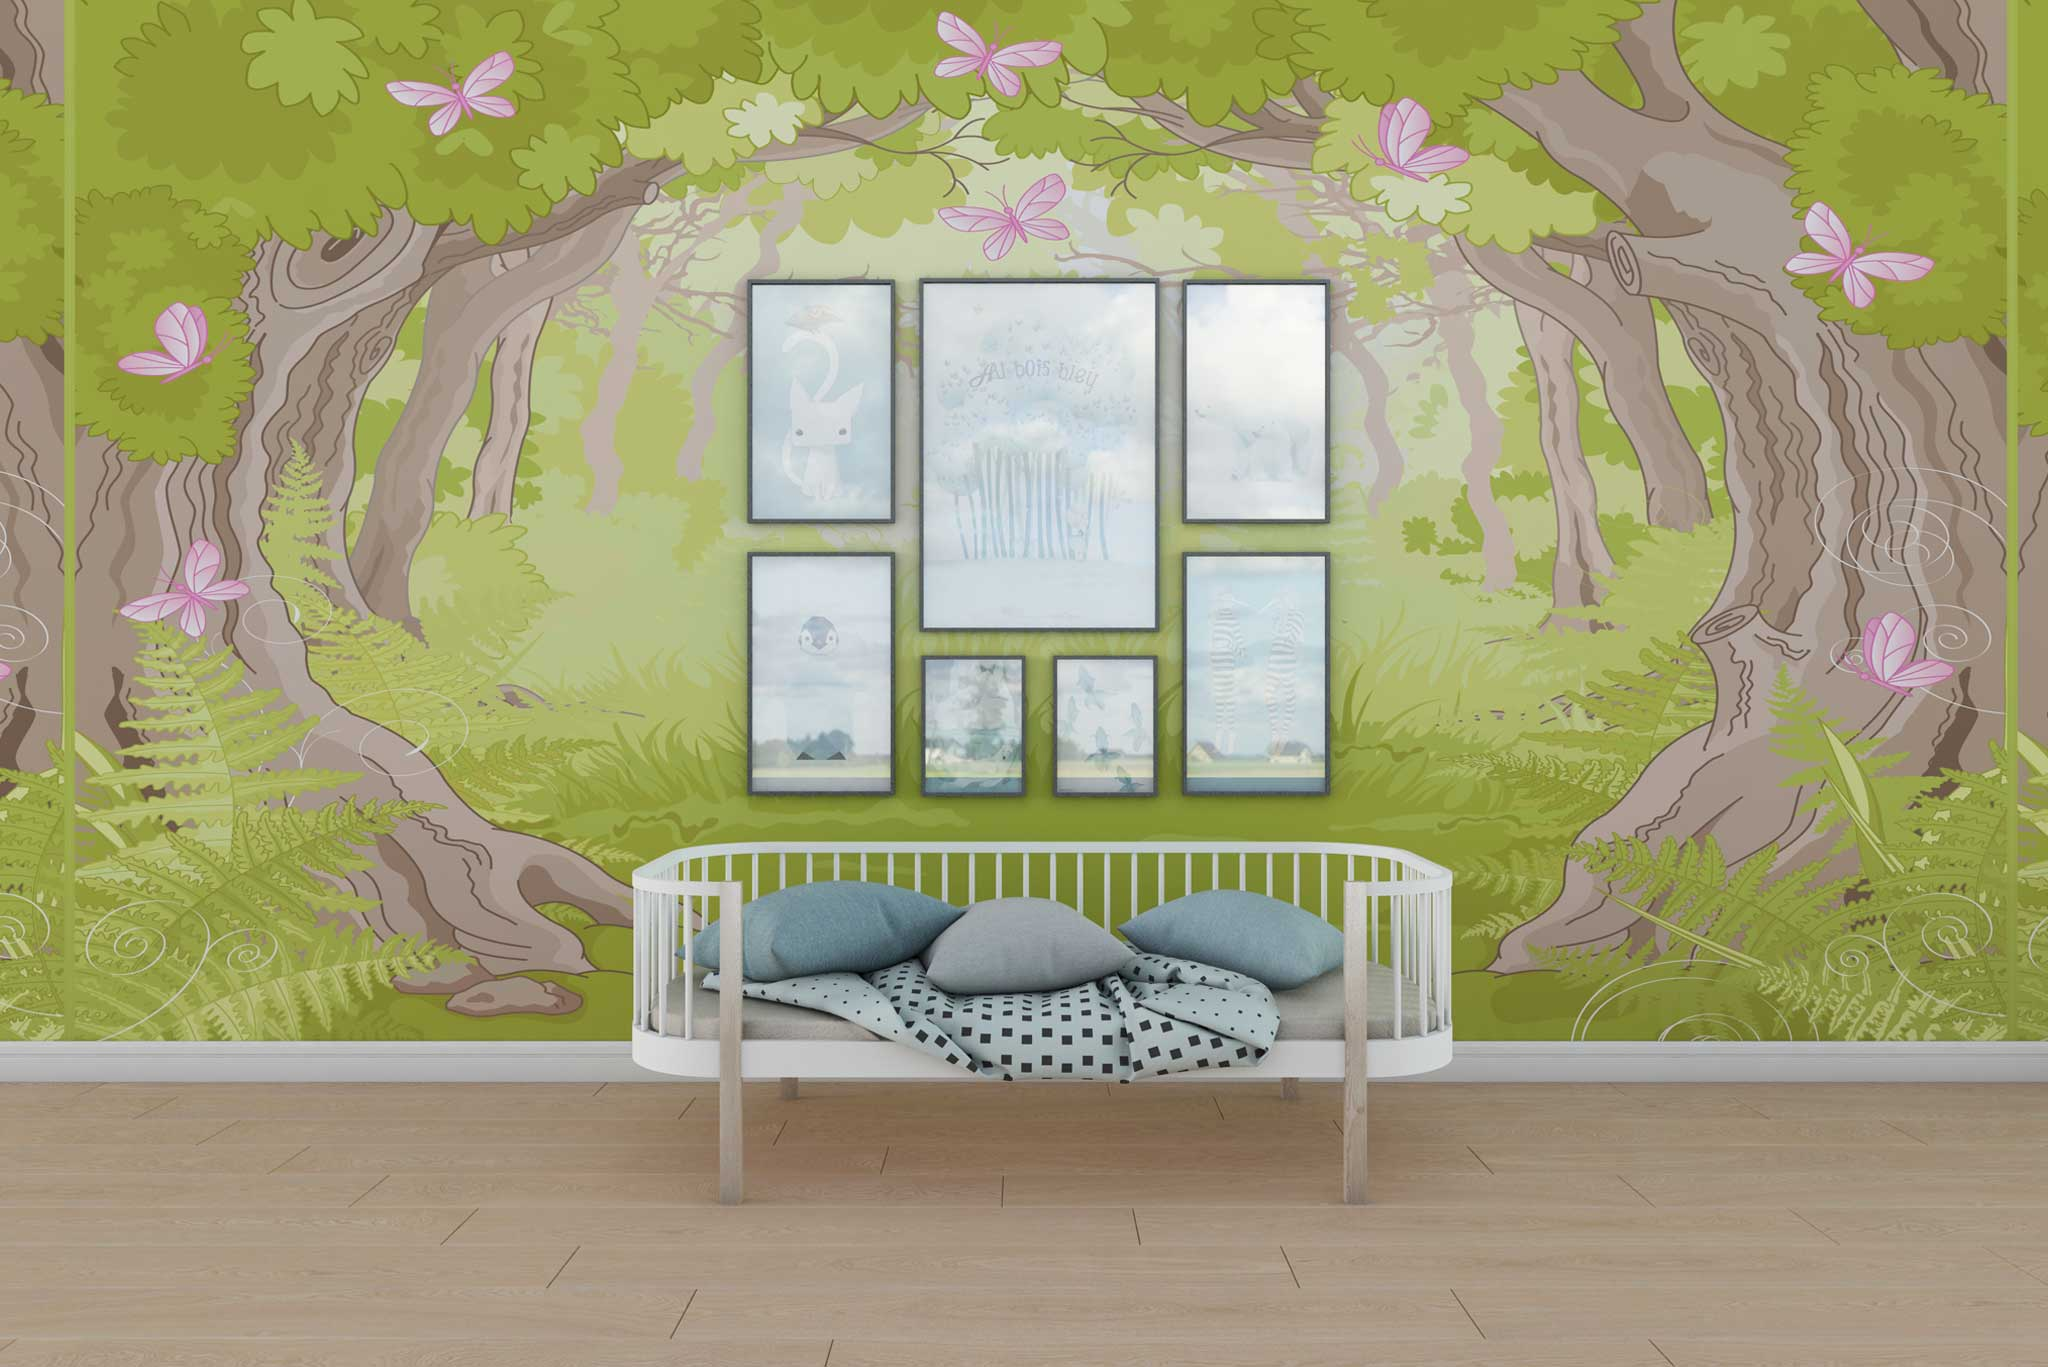 http://daringprints.ro/wp-content/uploads/2020/12/tapet-fototapet-design-personalizat-customizabil-comanda-special-camera-dormitor-copii-model-padurea-fermecata-poiana-fluturi-verde-roz.jpg